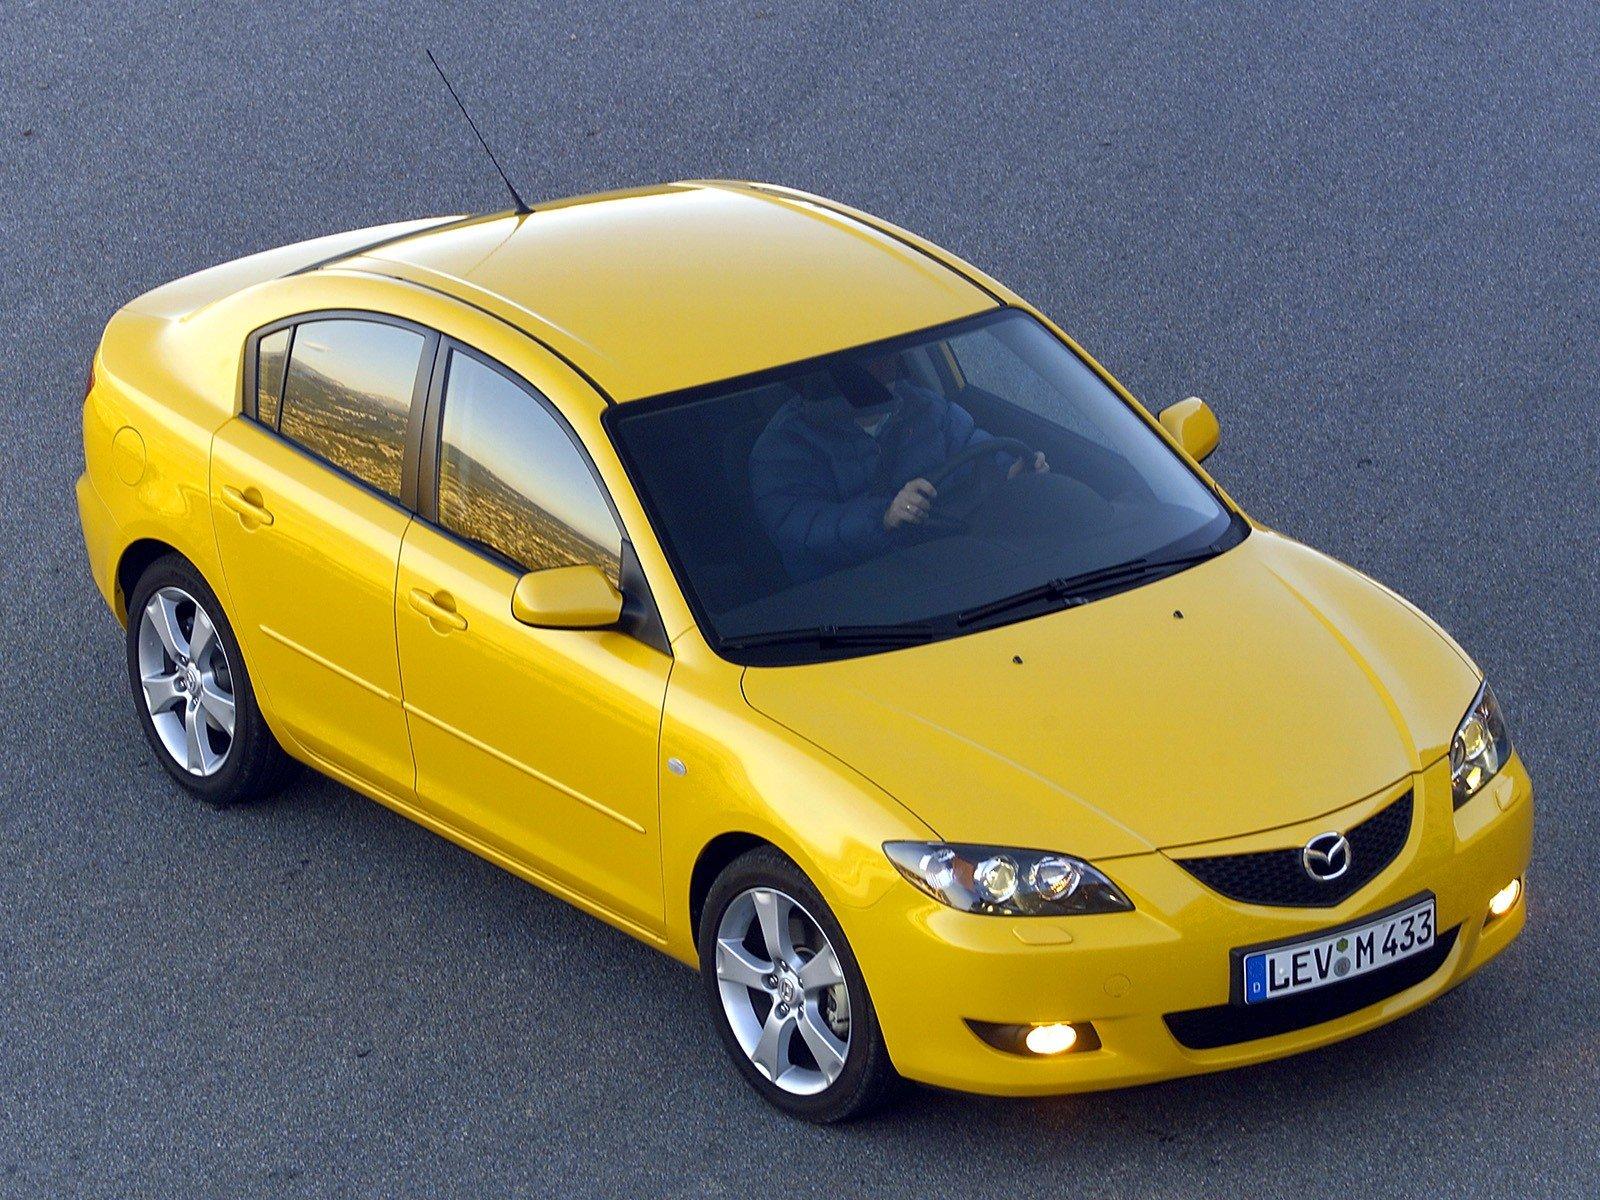 mazda 3 old yellow